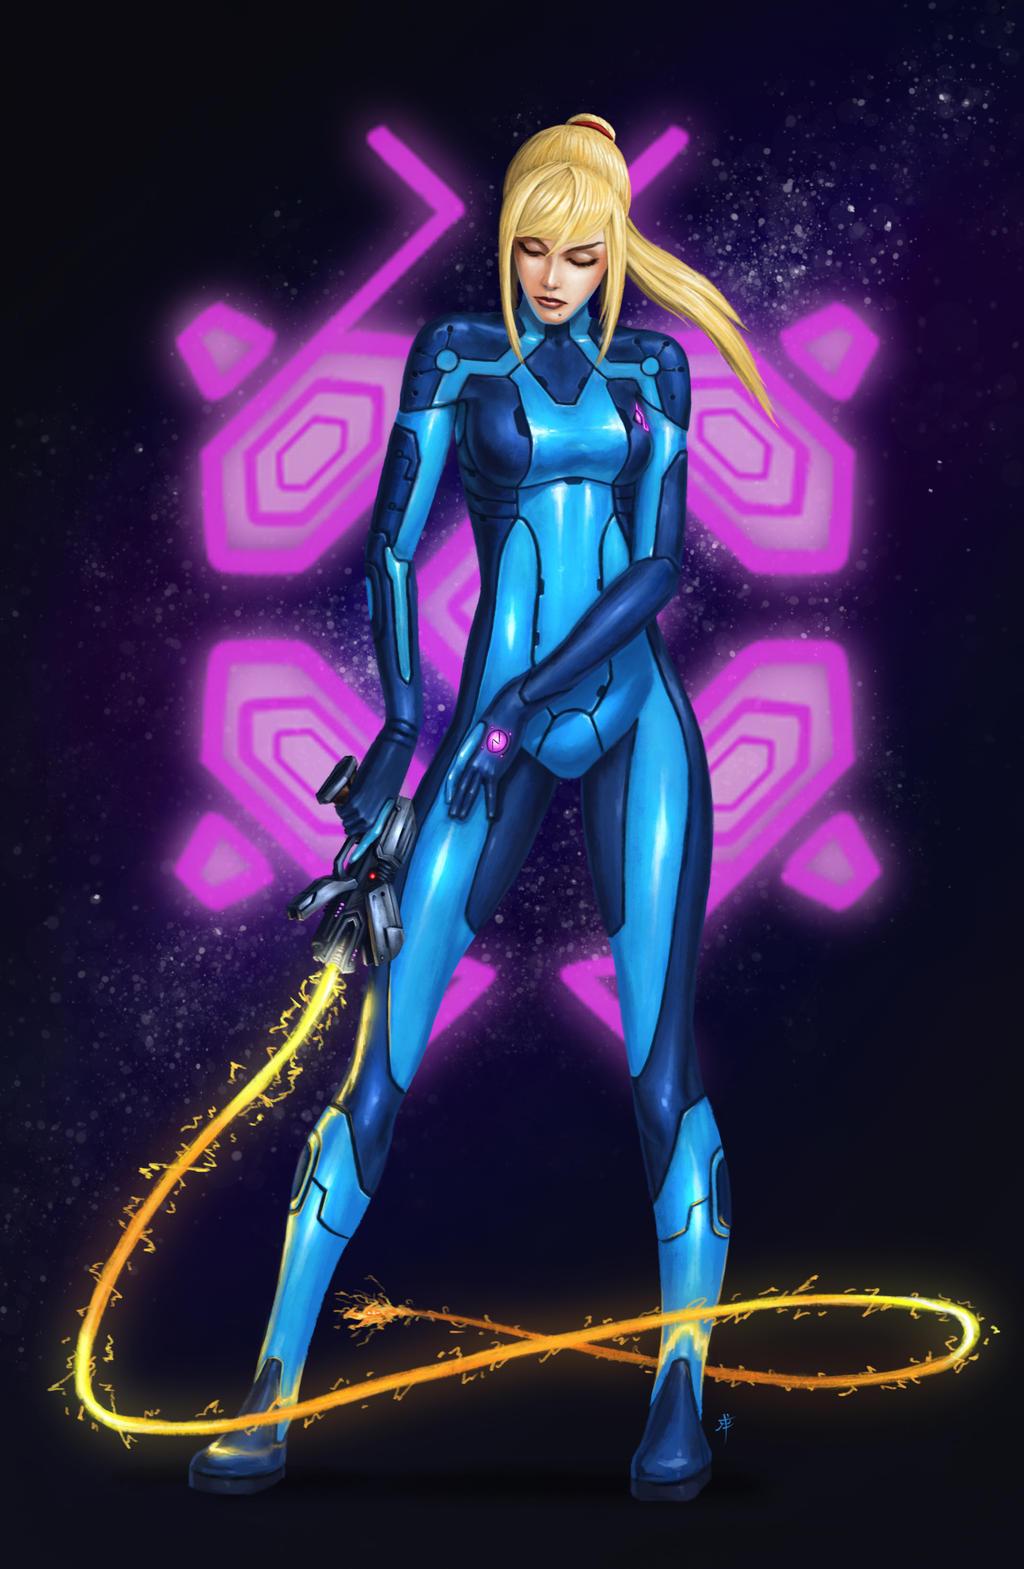 Samus Aran (Zero-suit) by rob-powell